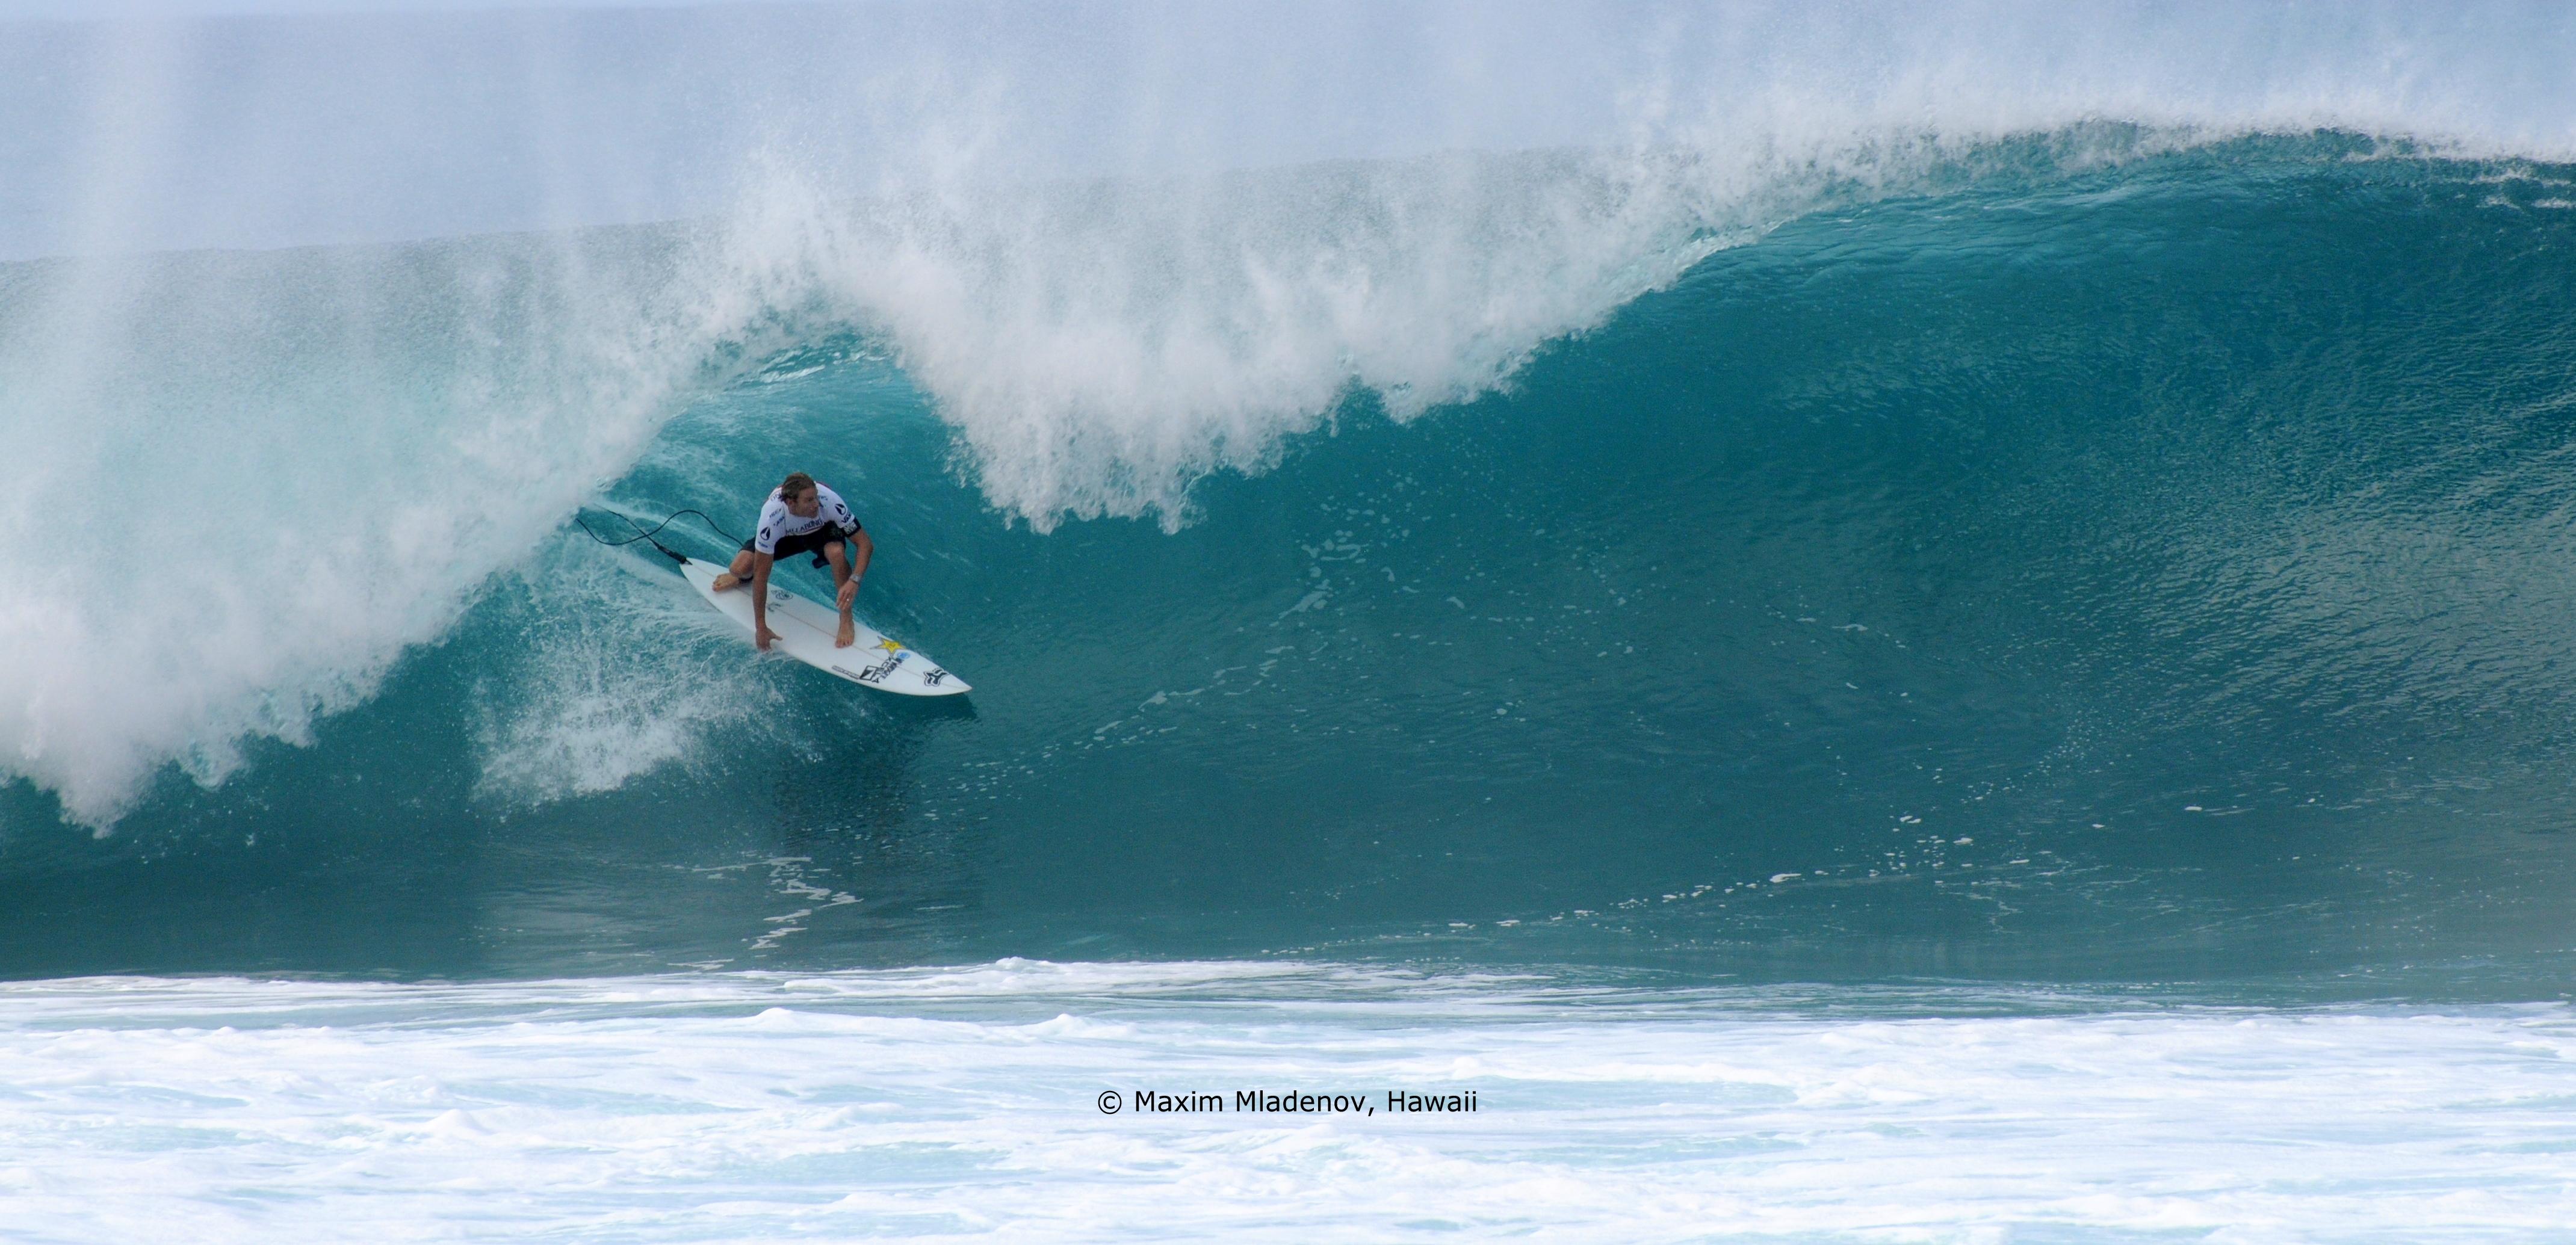 Tube parfait -sequence01- 1er Tour 08-12-2011 Billabong PIPE Masters © Maxim Mladenov, Hawaii